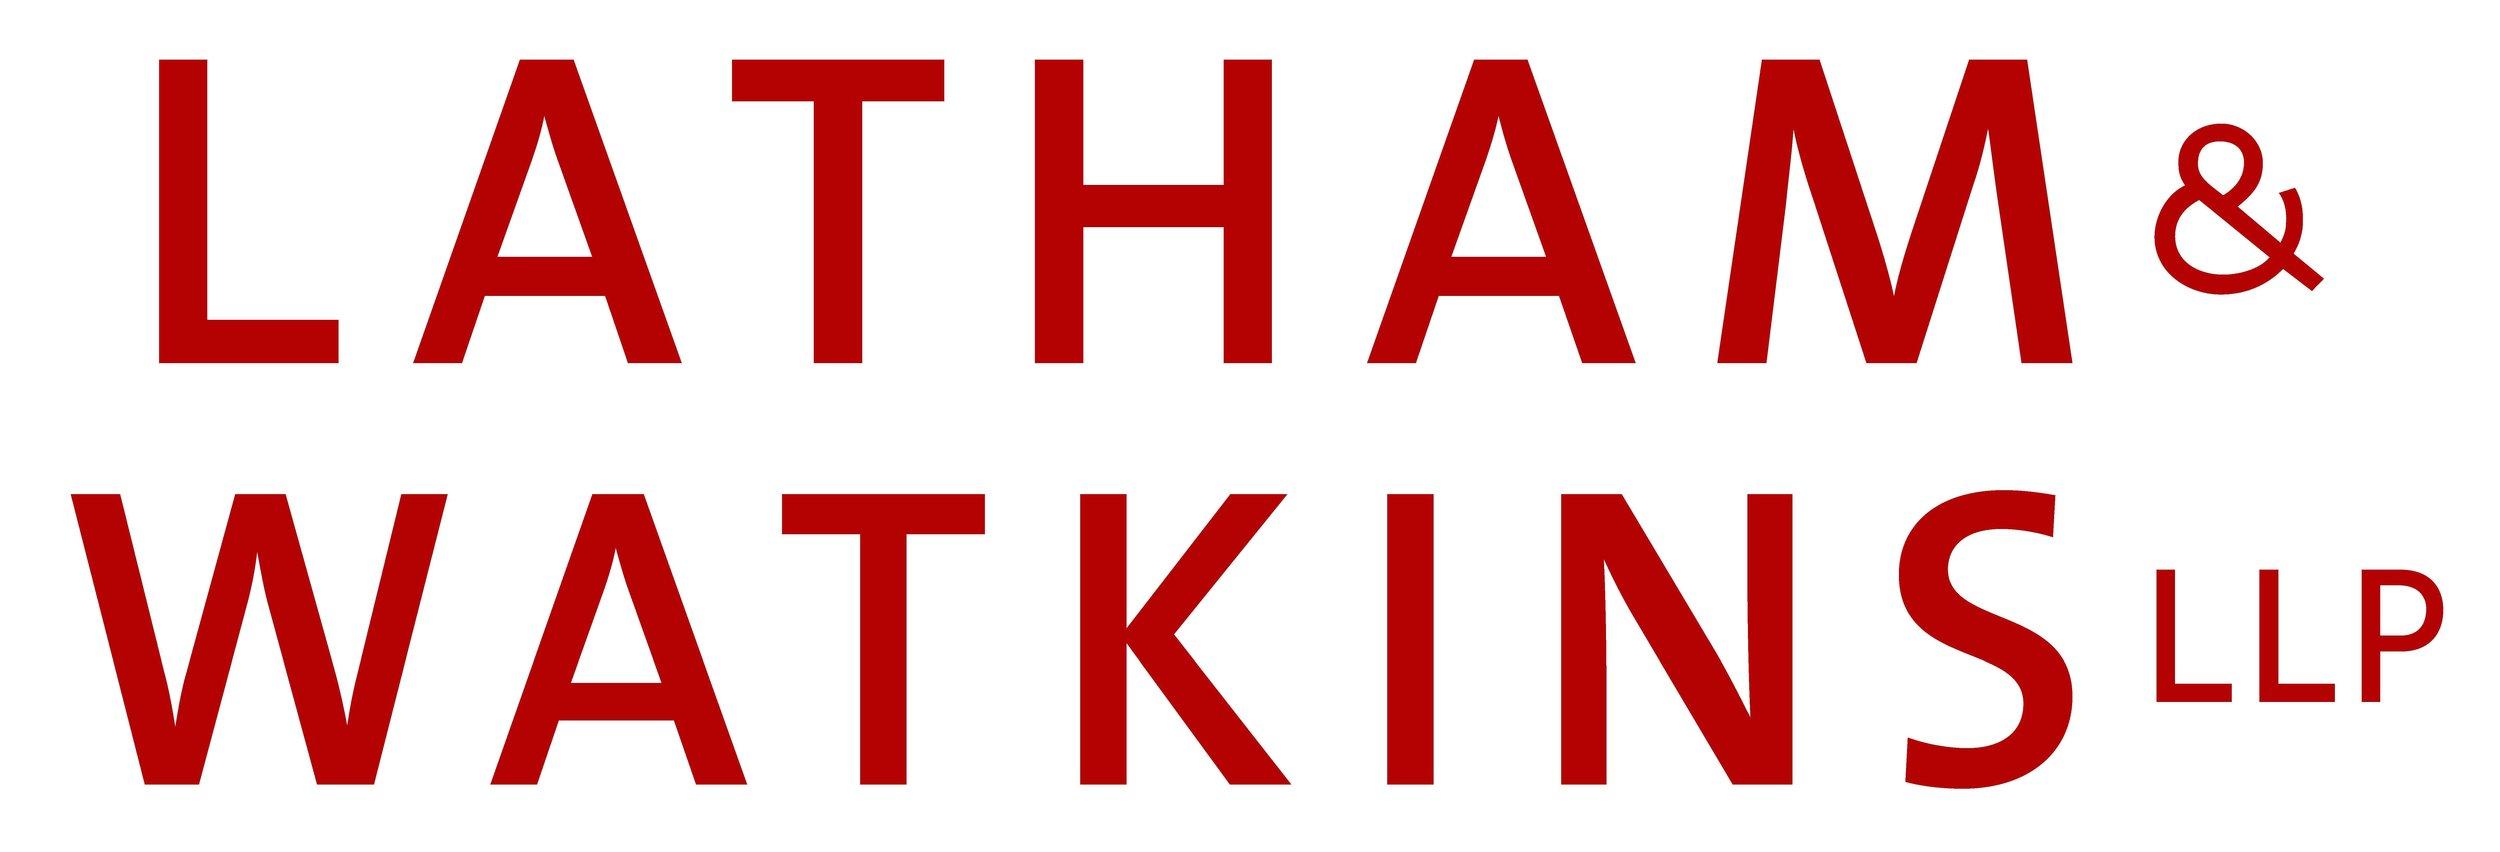 latham-and-watkins-logo_cropped.jpg